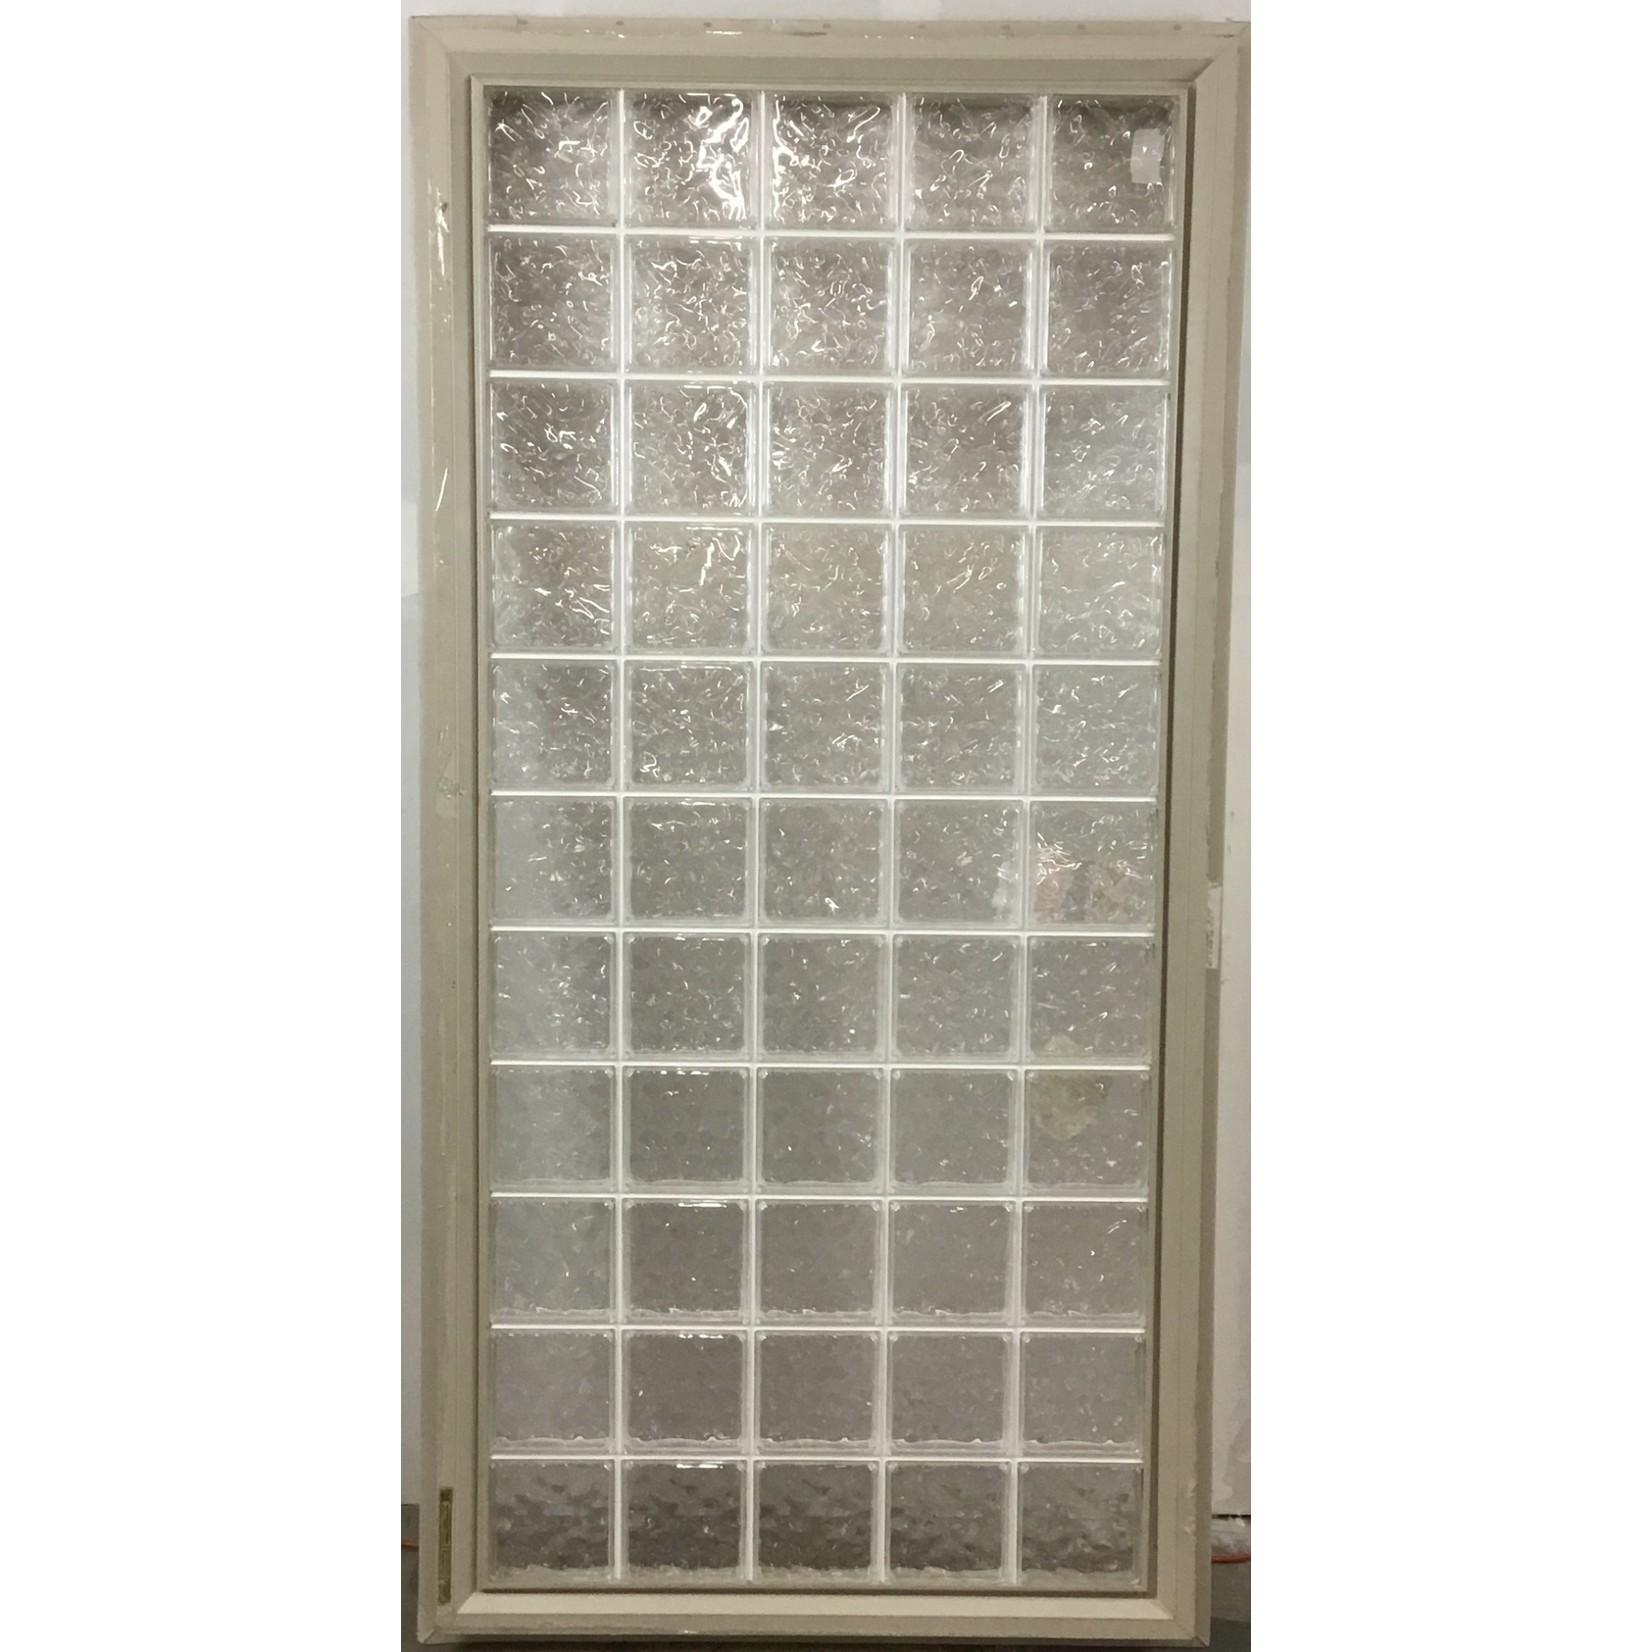 10485 Hy-Lite Design Block window